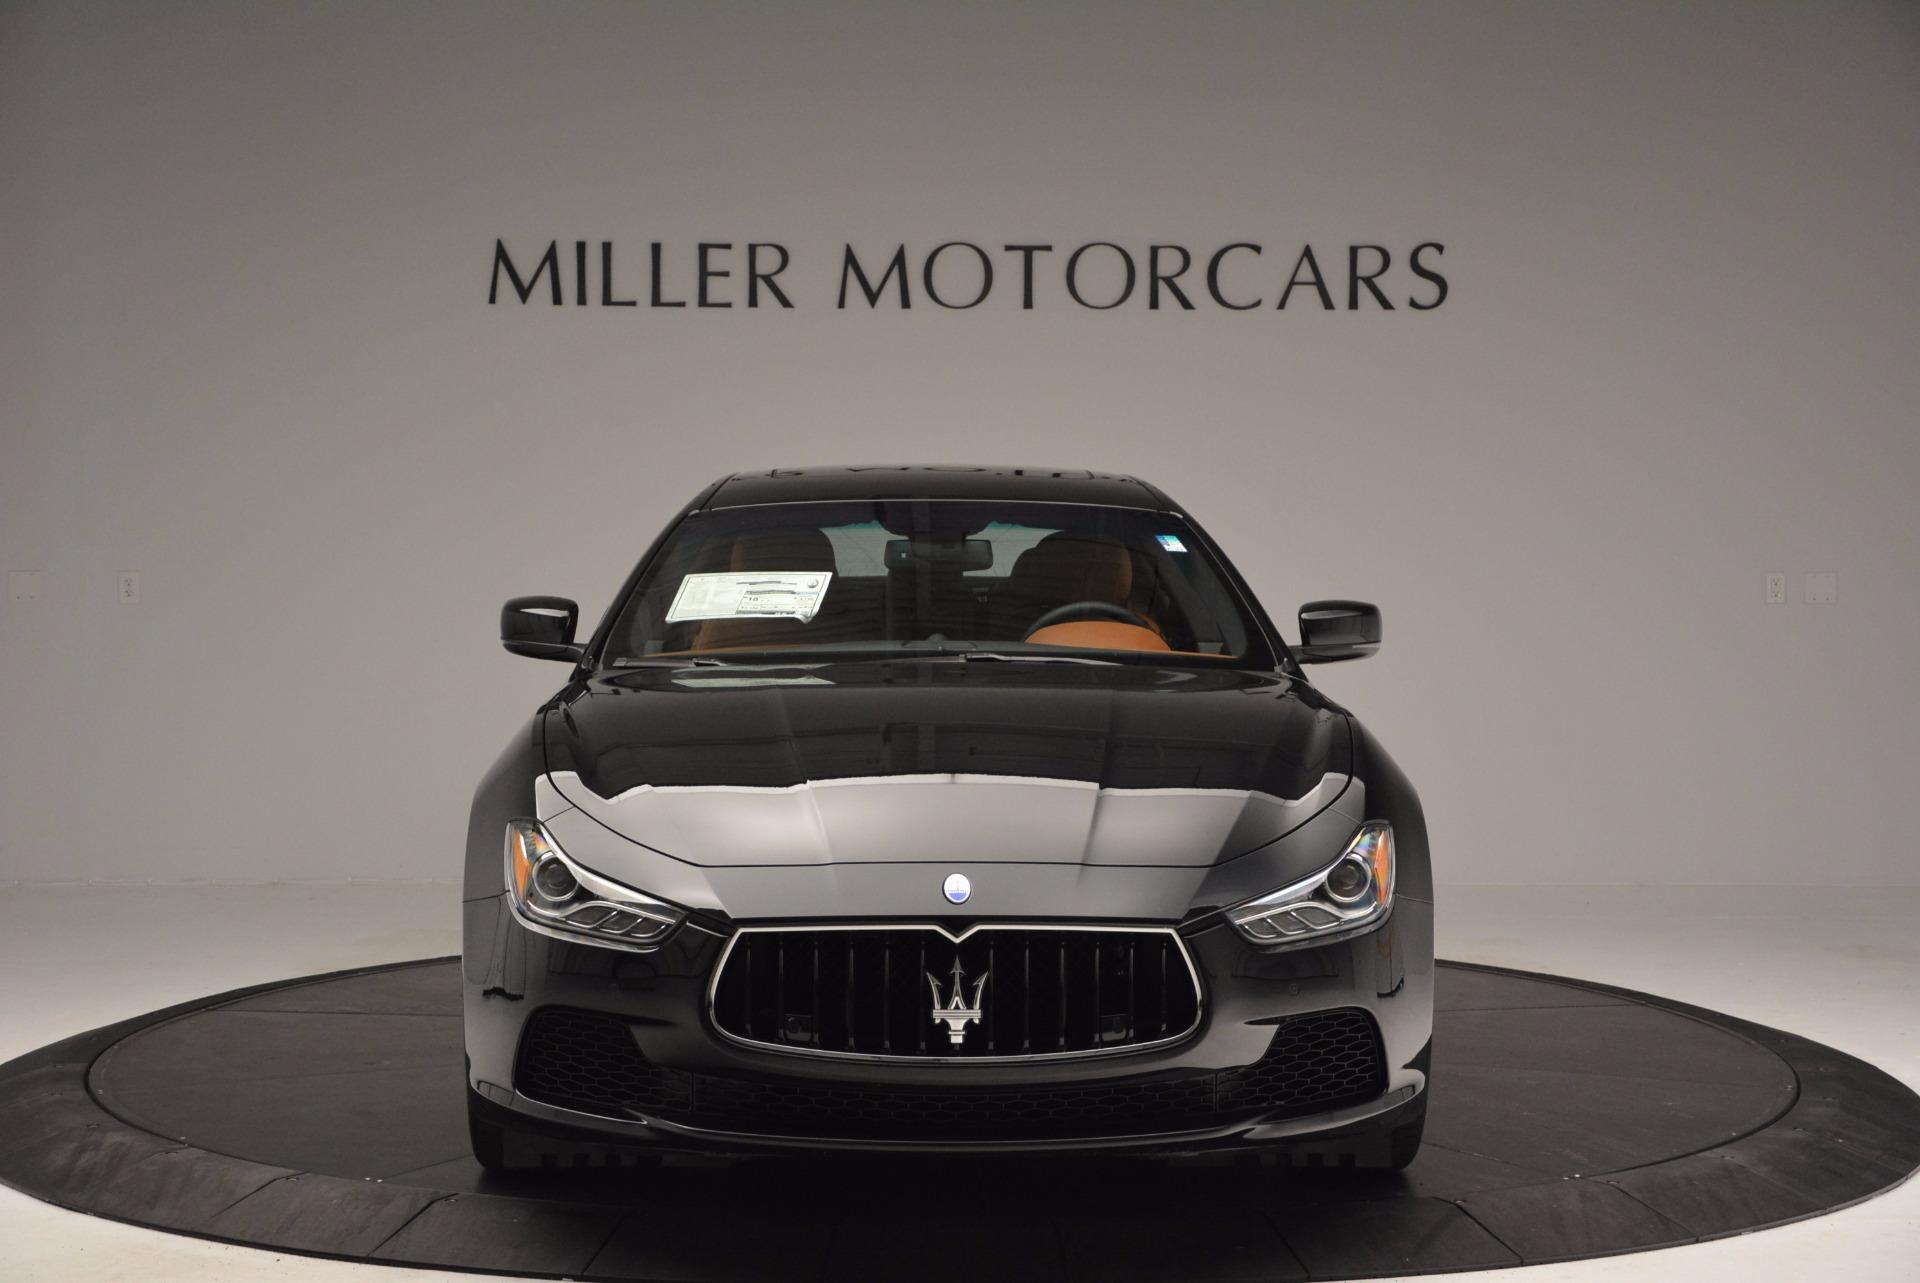 Used 2014 Maserati Ghibli S Q4 For Sale In Greenwich, CT. Alfa Romeo of Greenwich, 7249 1459_p12